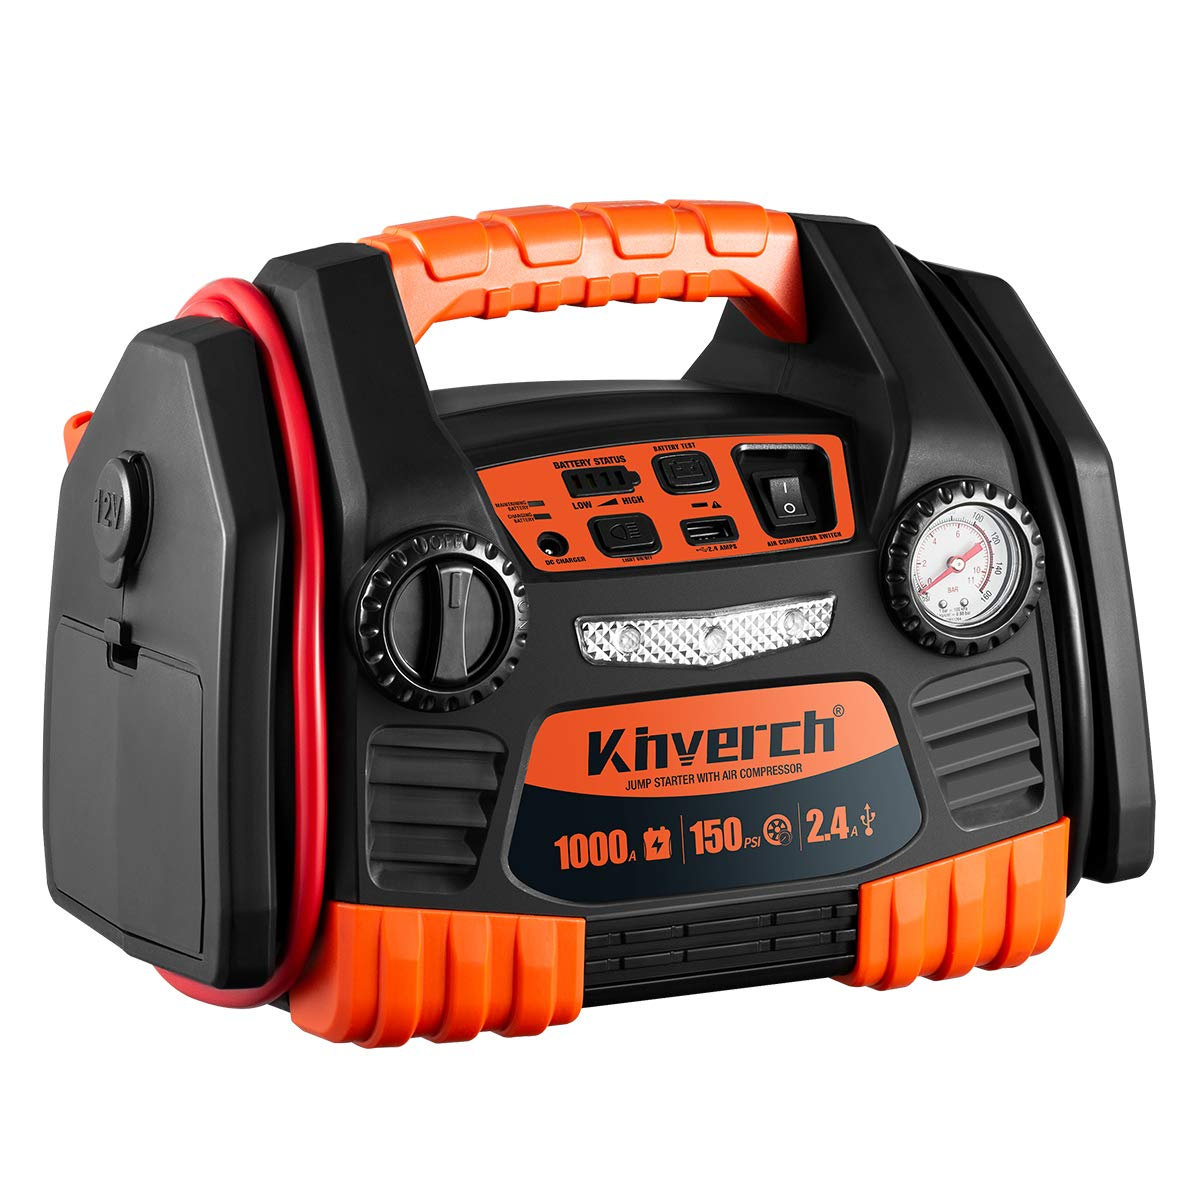 Kinverch Portable Car Jump Starter 1000 Peak Amp 12 Volt with 1-USB 1-12V Power Ports & 150 PSI Air Compressor